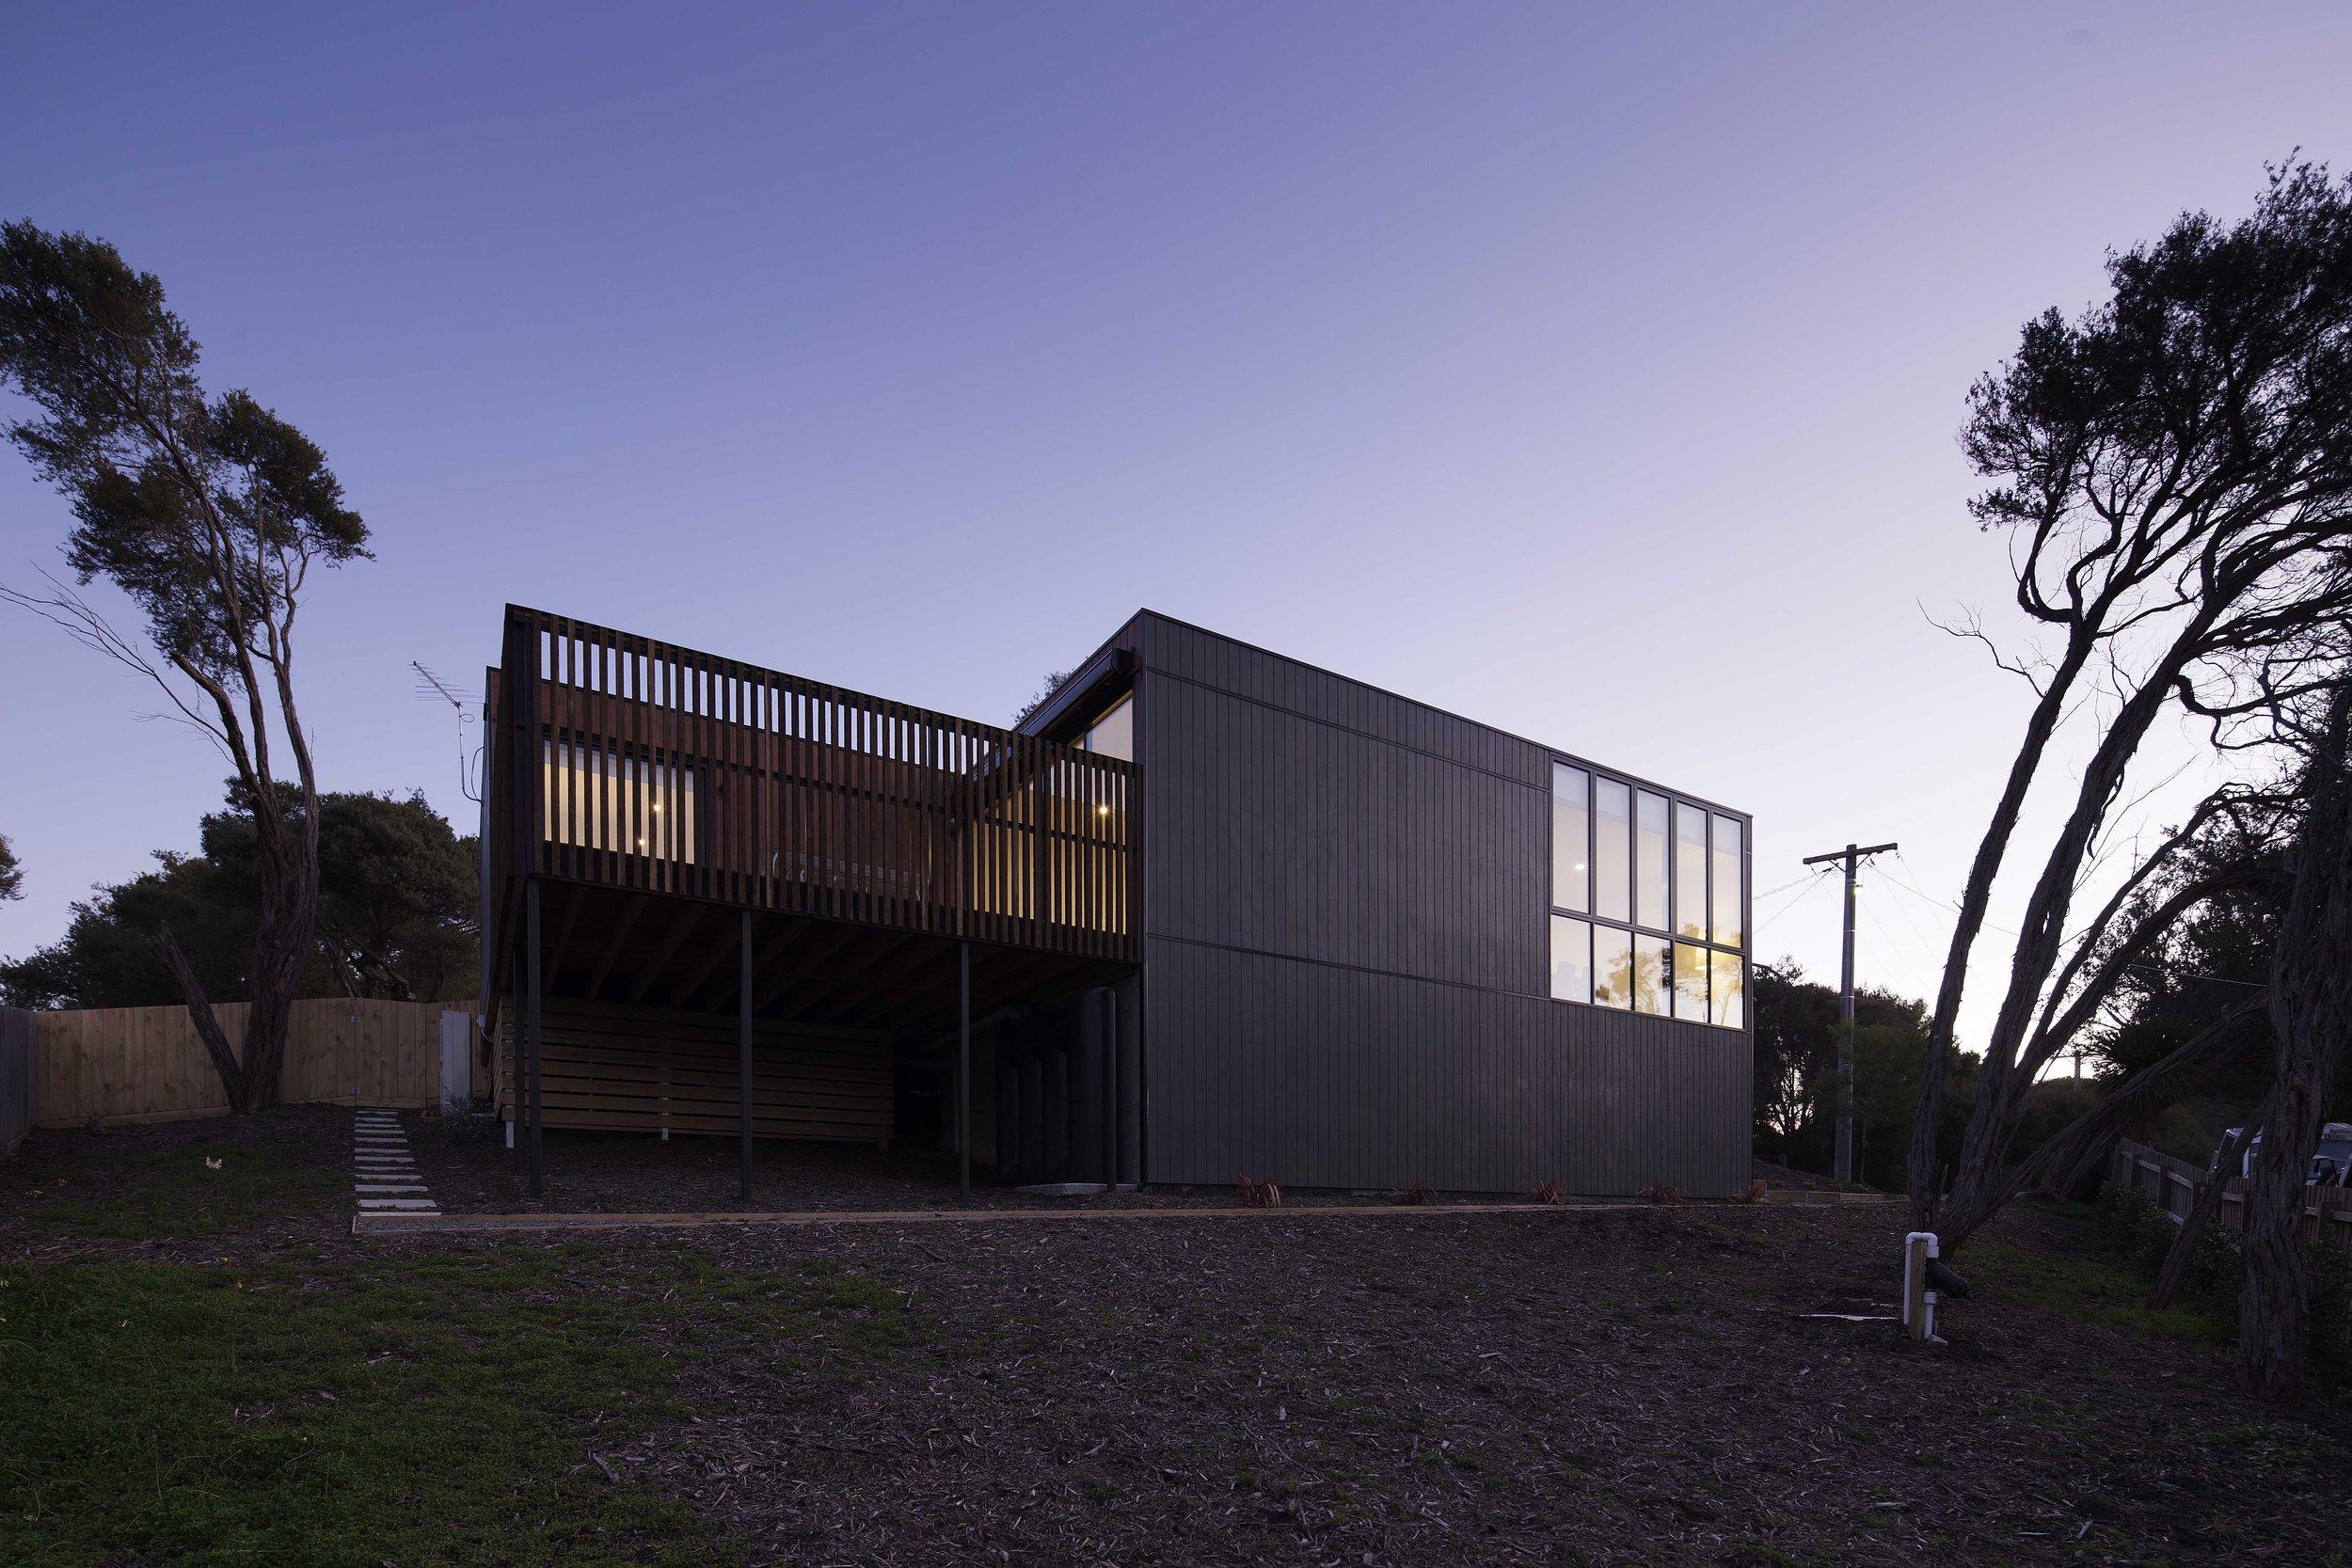 Pitch_Architecture_Black Box House_2